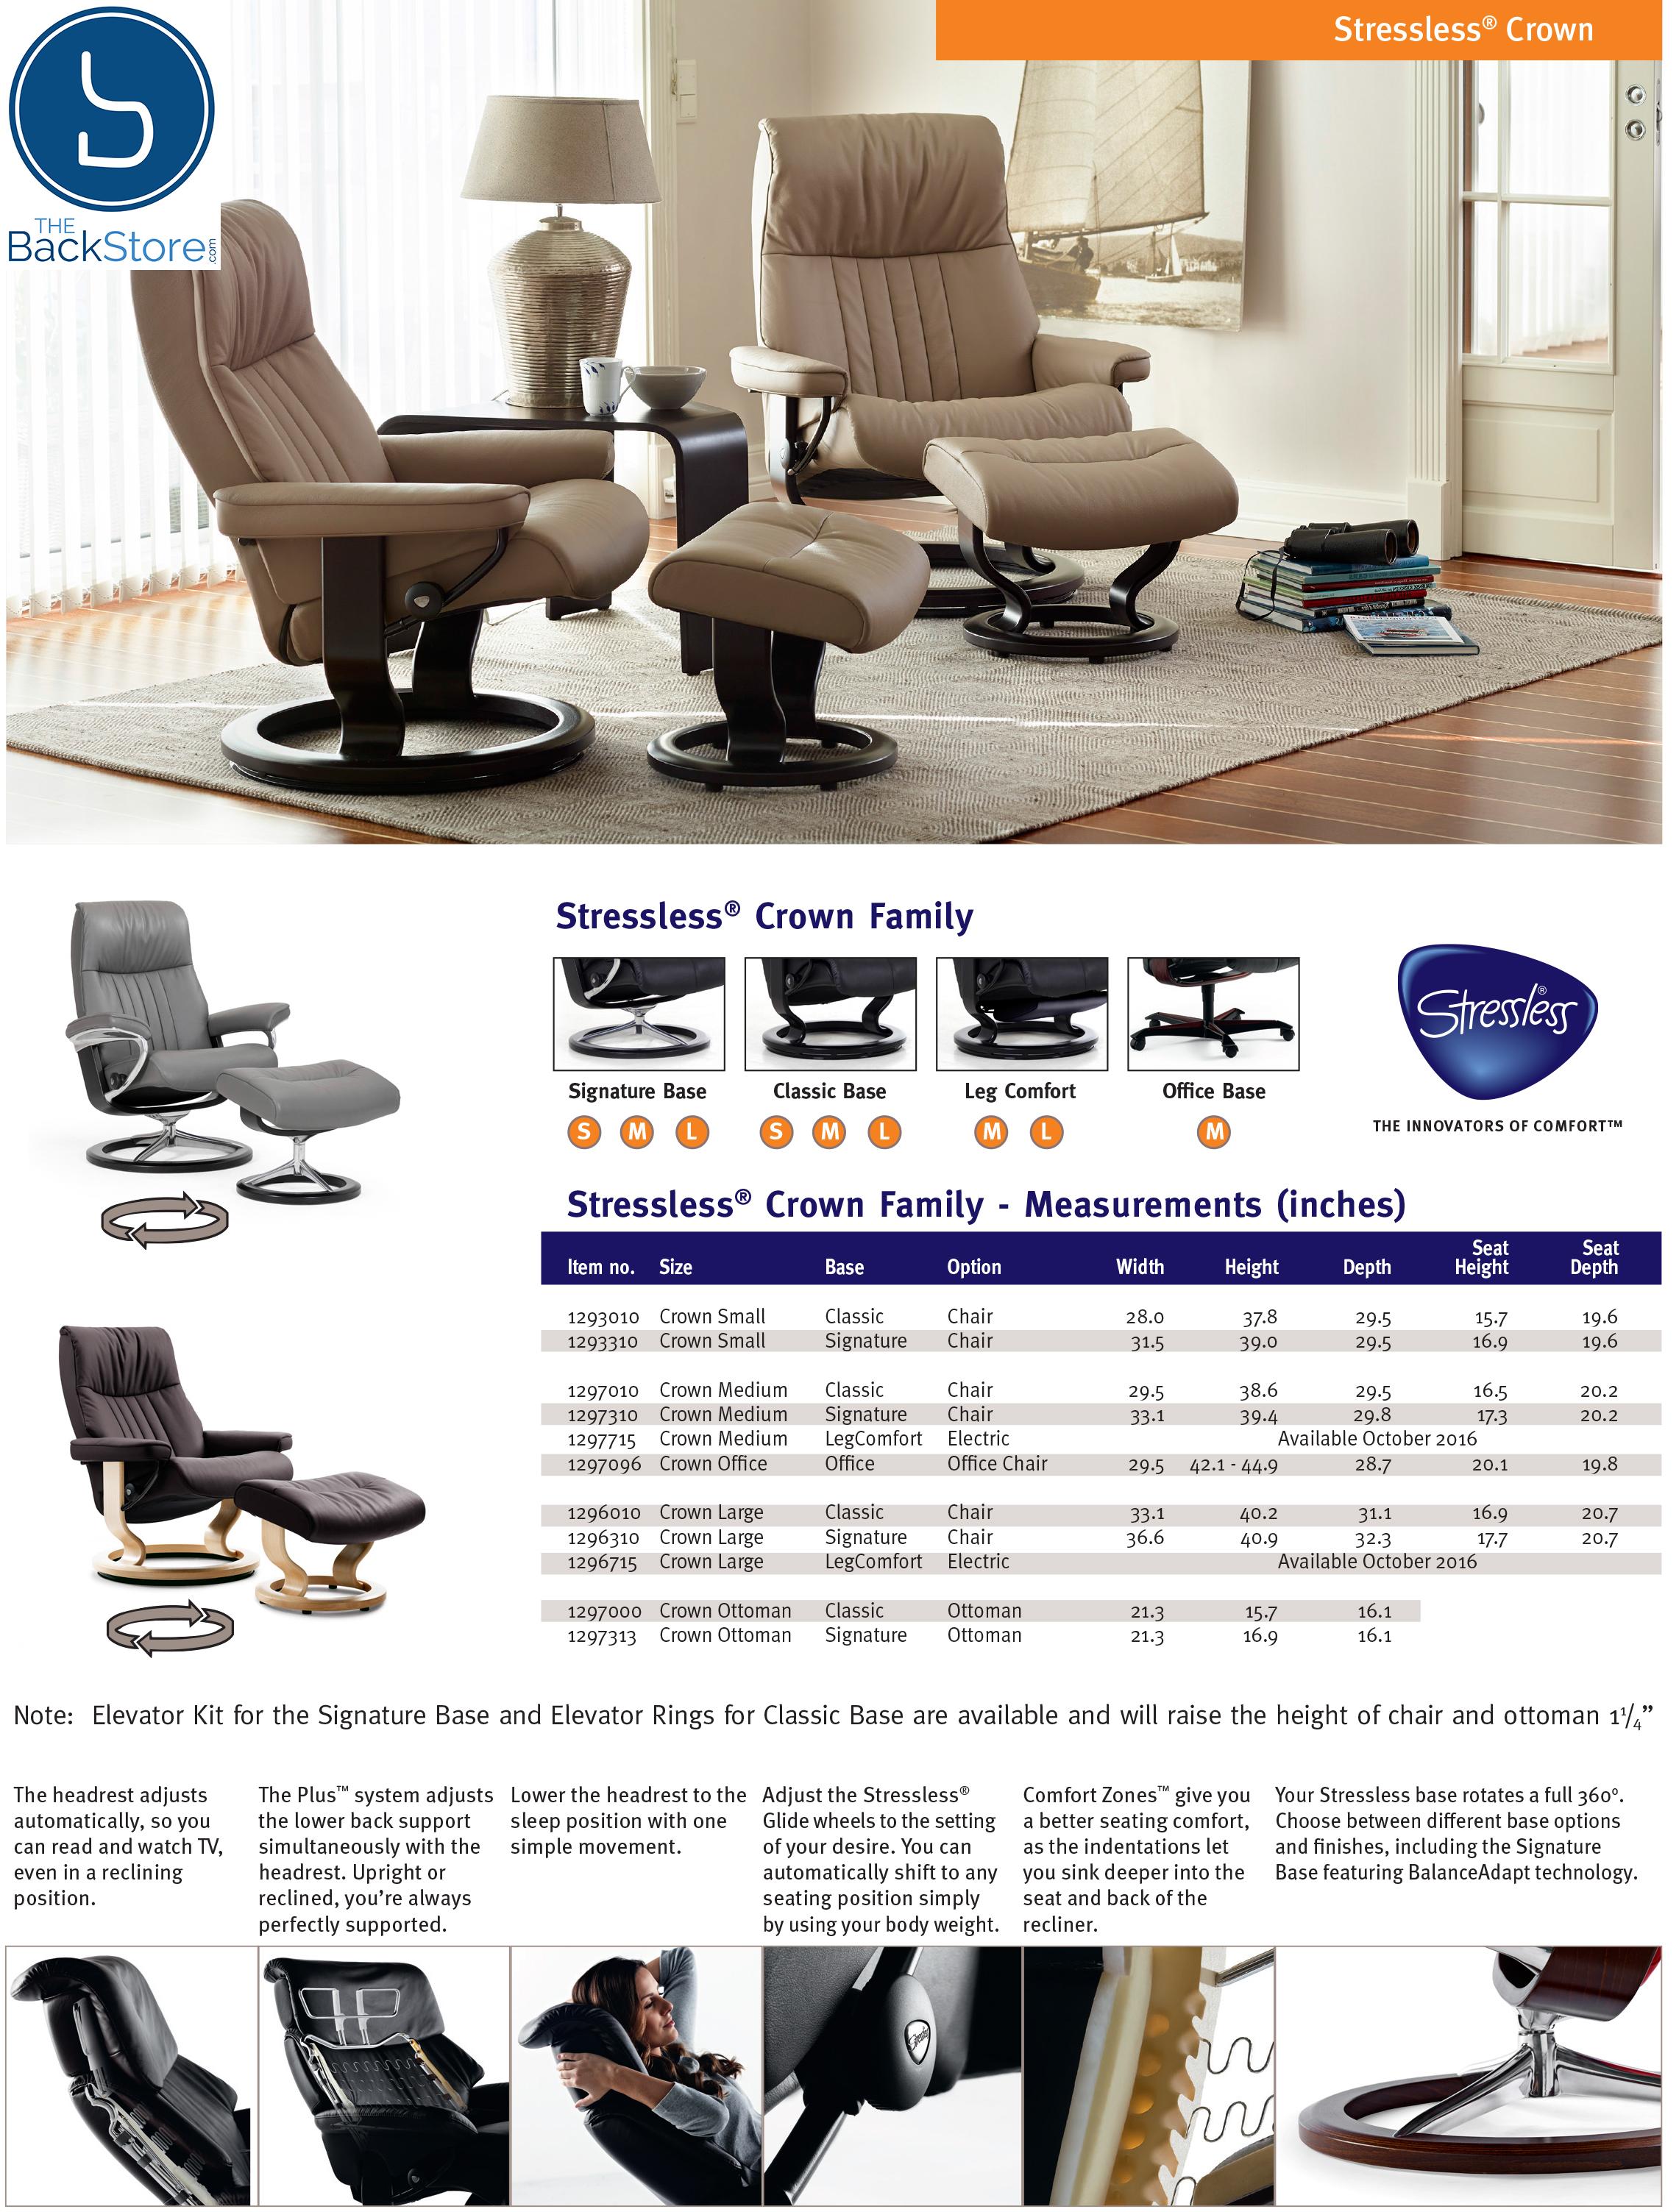 Ekornes Stressless Crown Recliner Chair Lounger and Ottoman